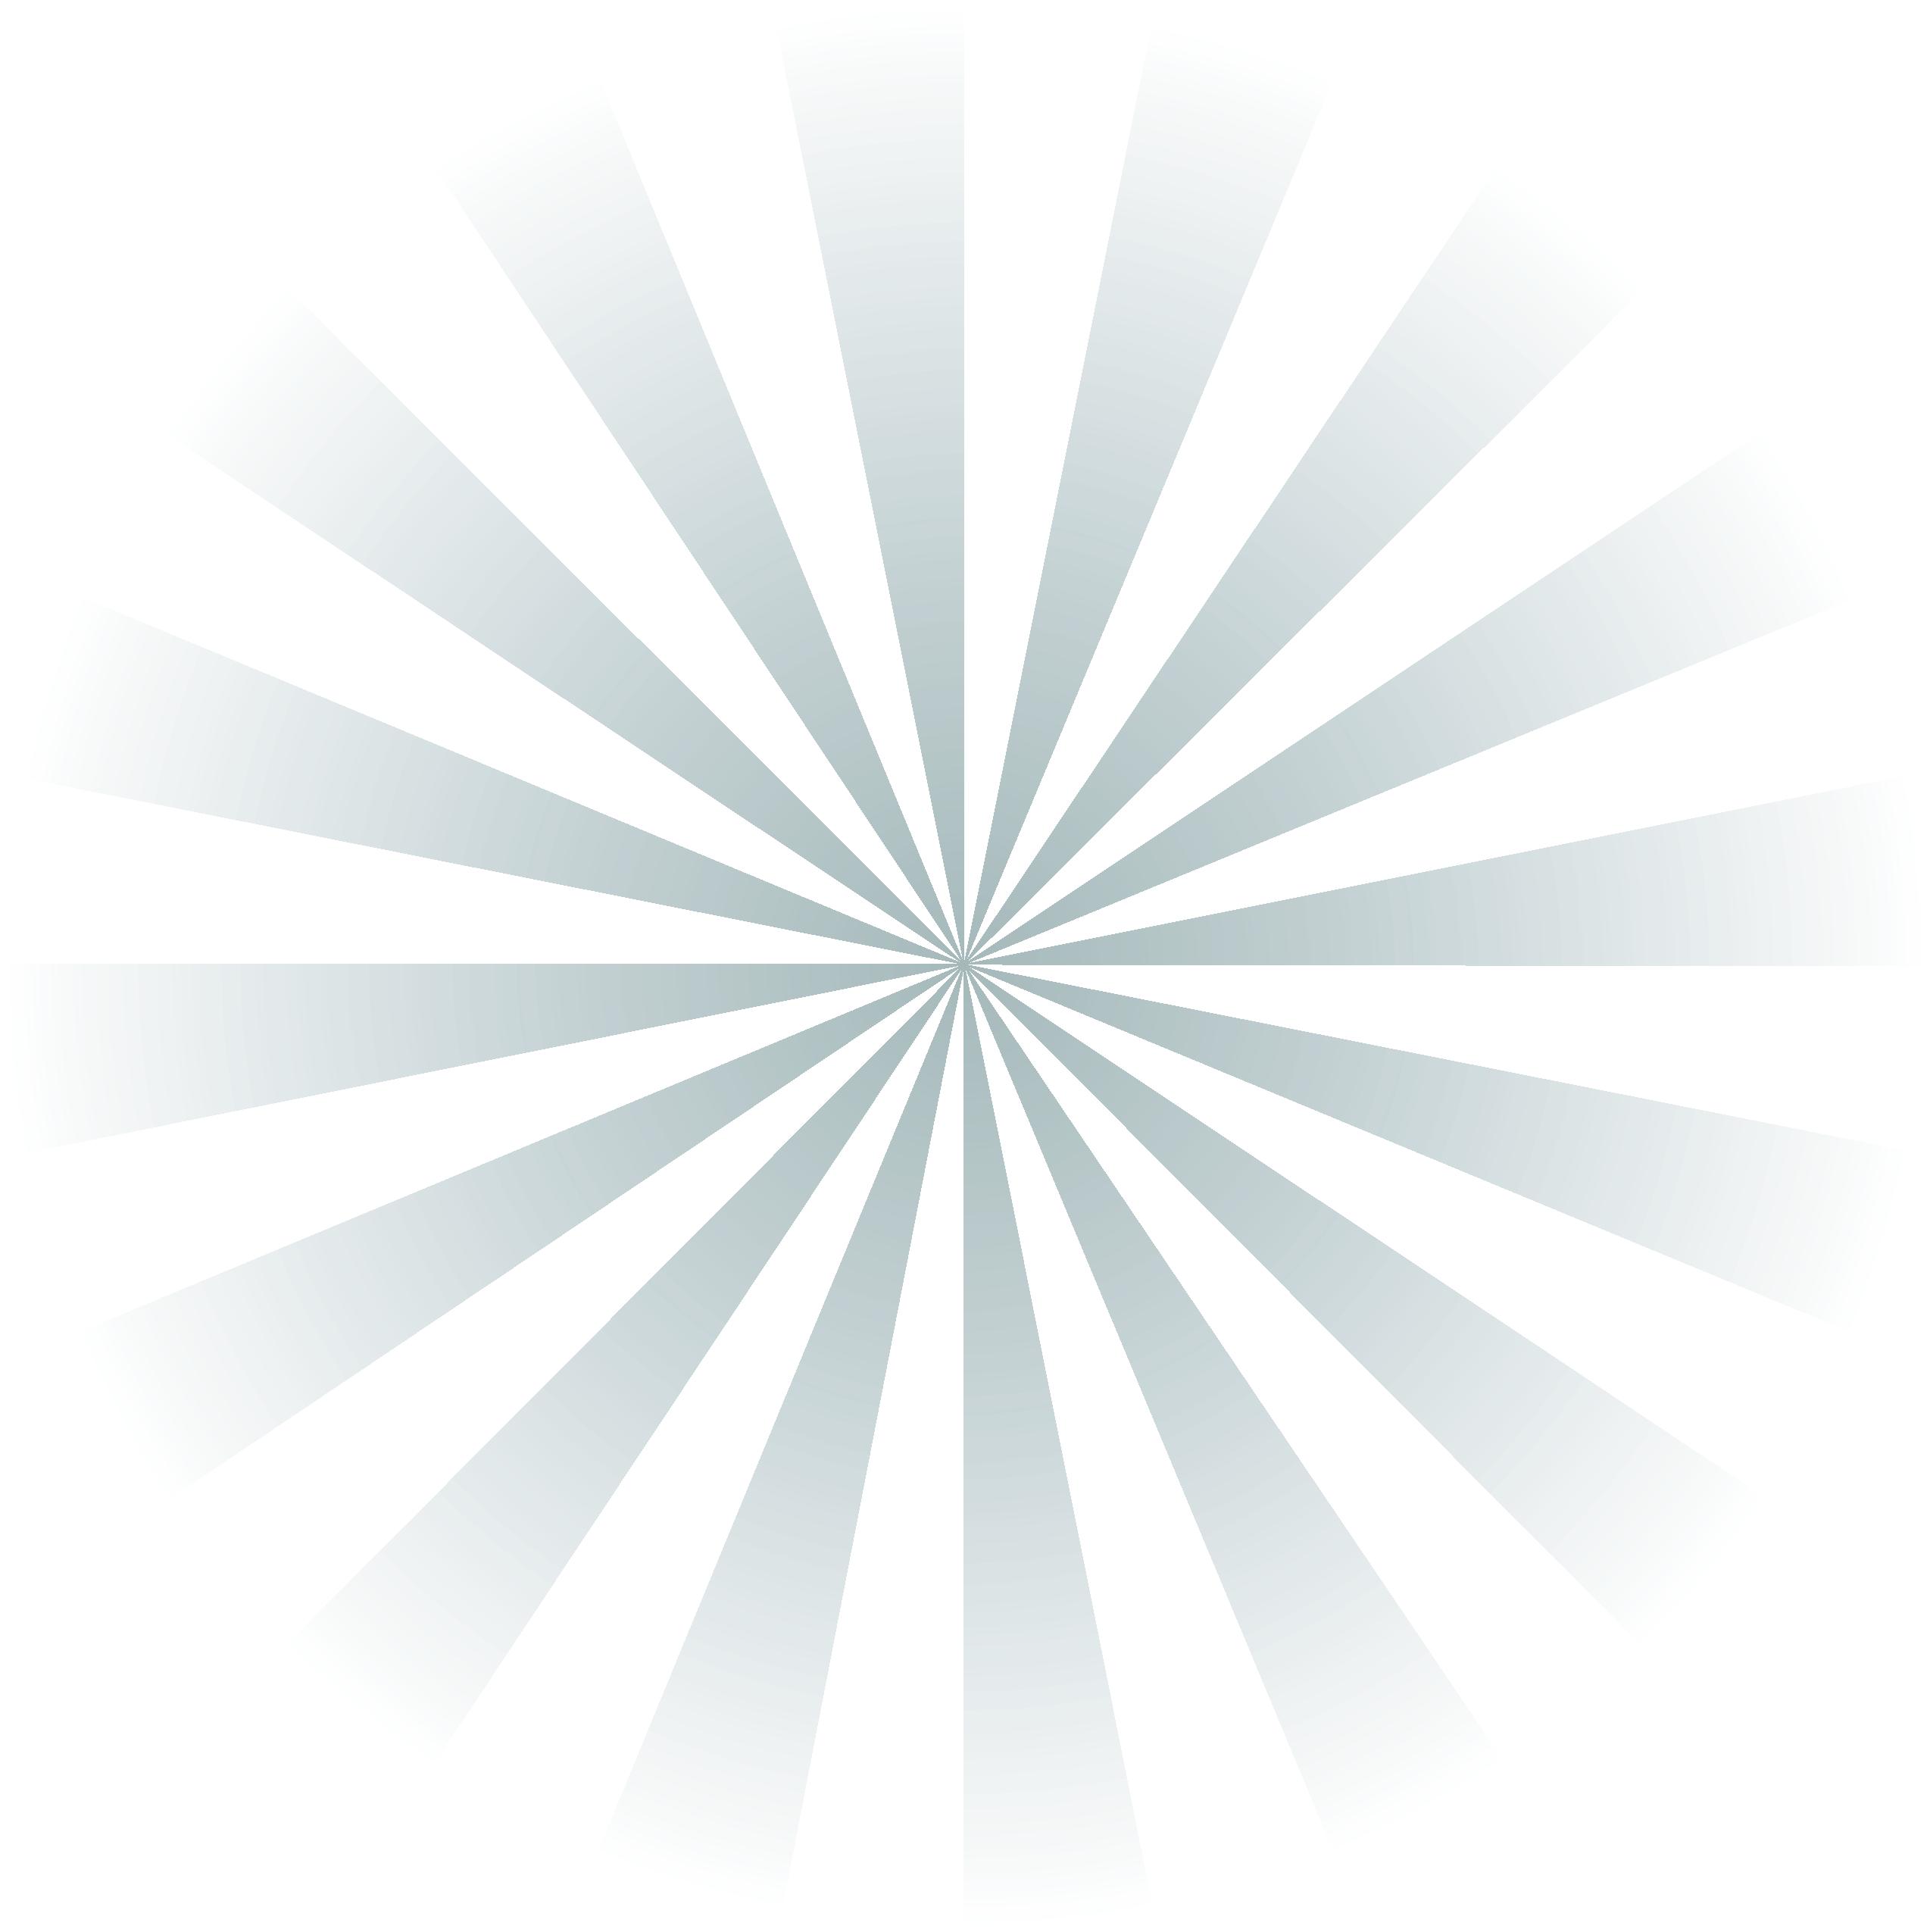 toastmasters international logo and design elements